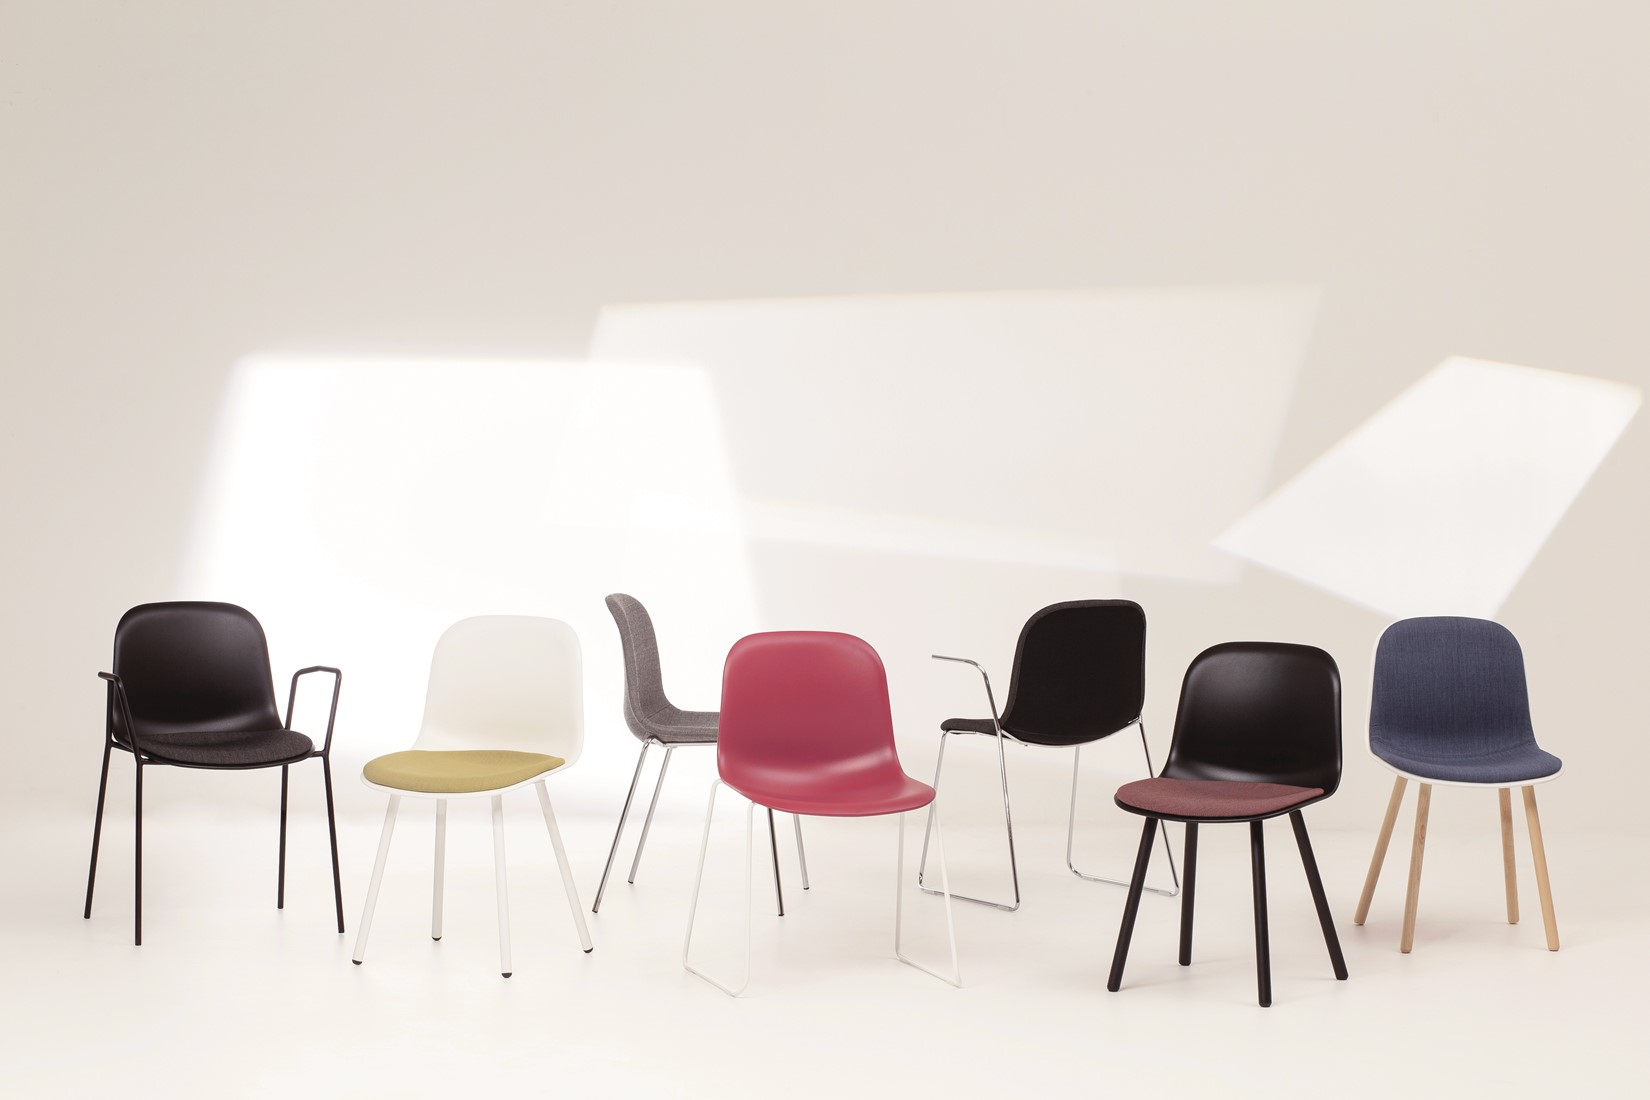 Mani l vriendelijk vormgegeven kunststof stoel frame zwart